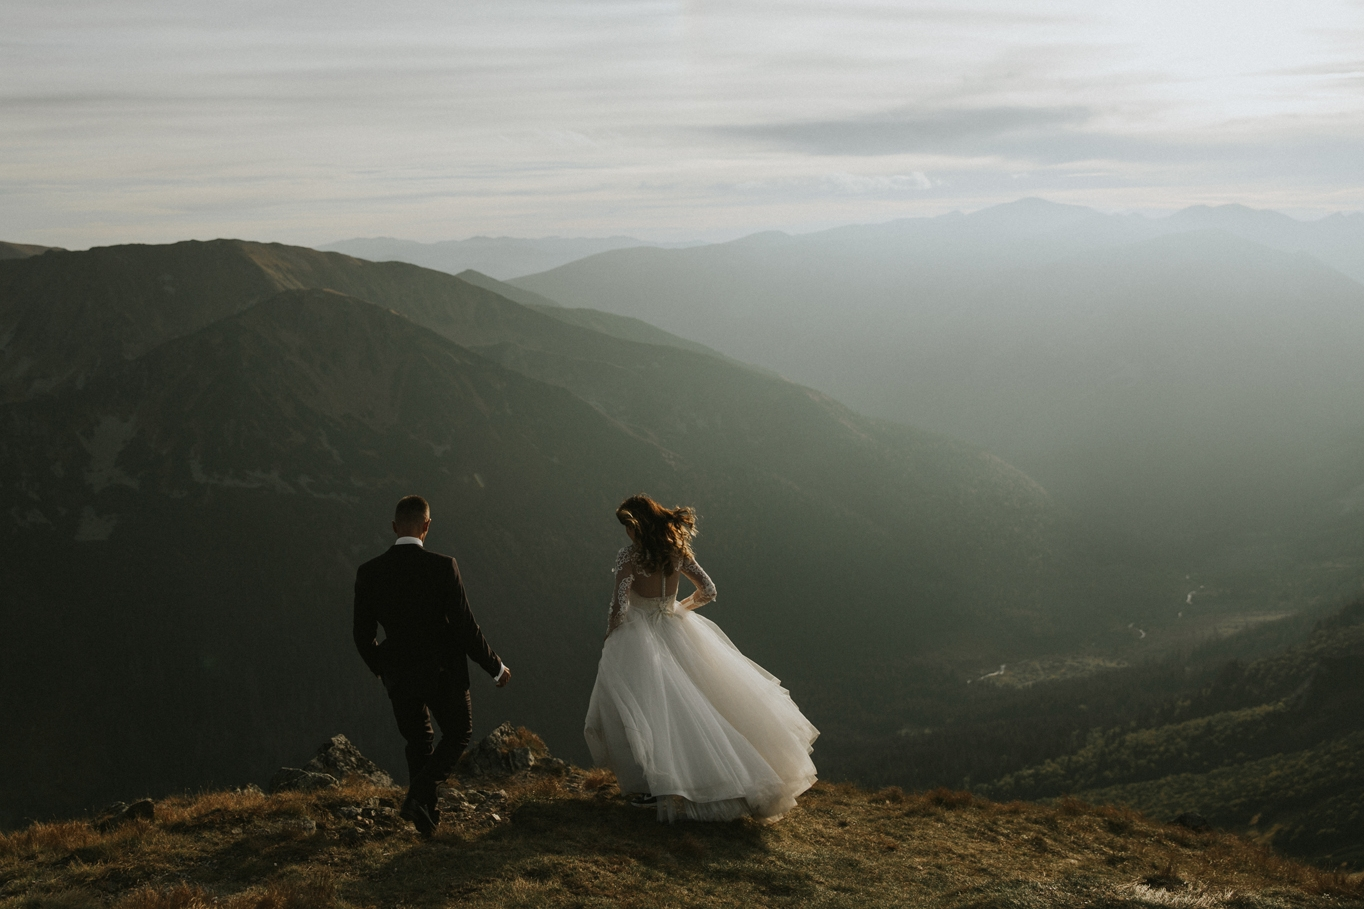 mountains_Klaudia&Dawid_weddingphotographer056.jpg